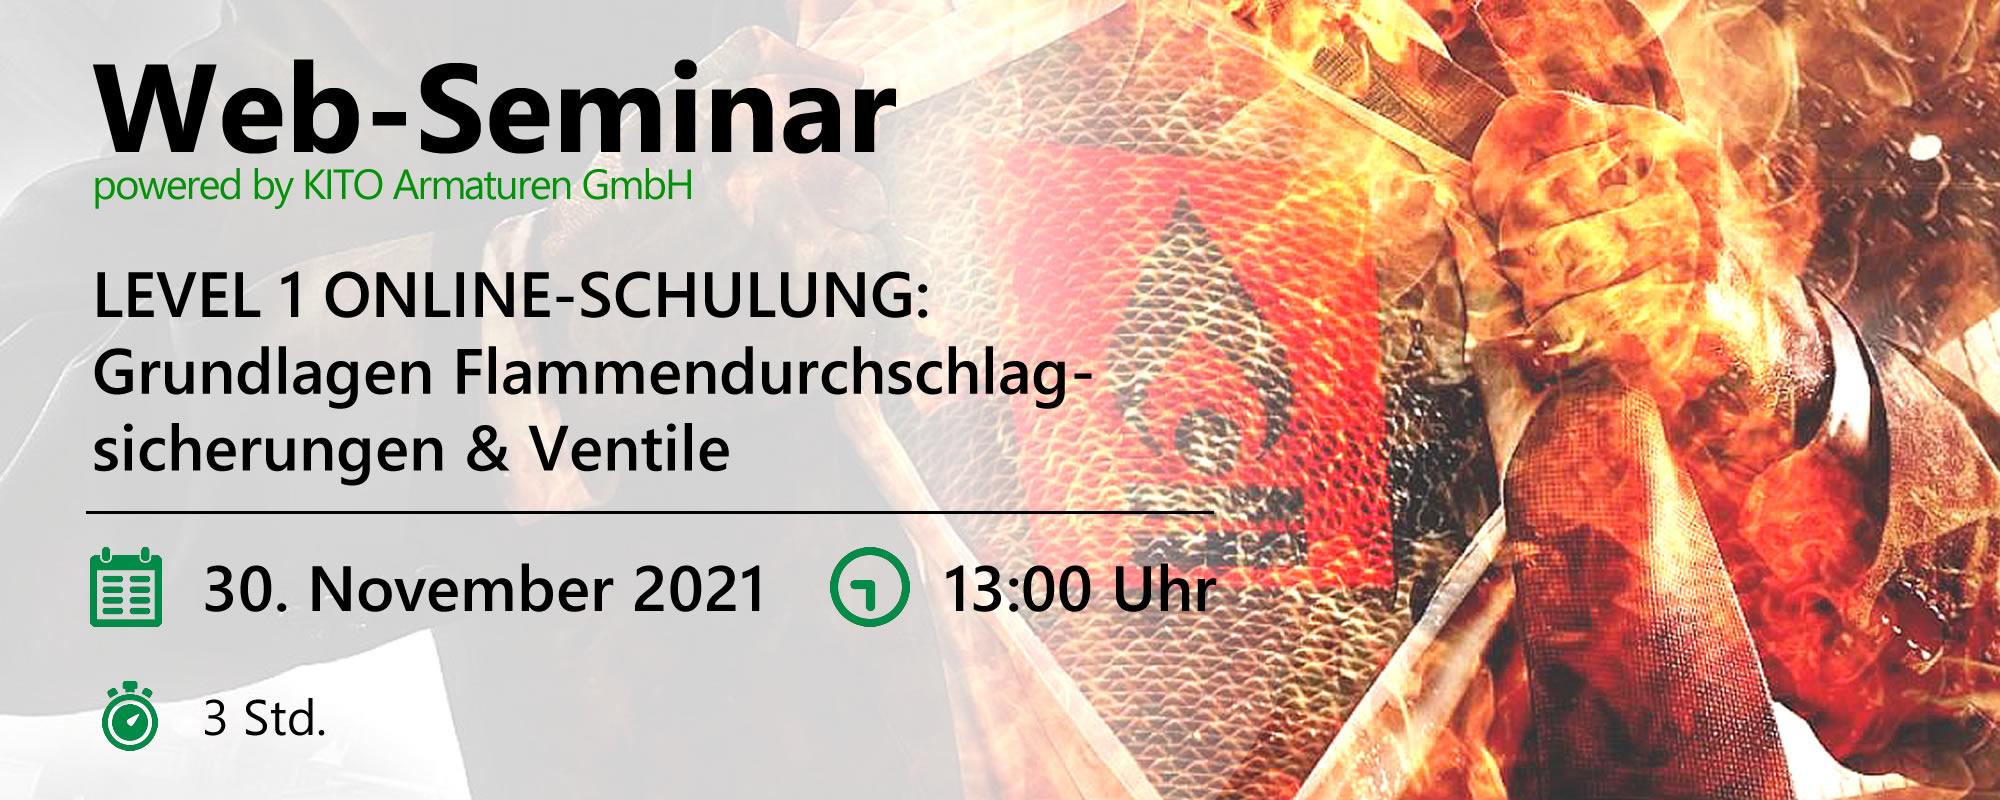 Web-Seminar am 30.11.2021